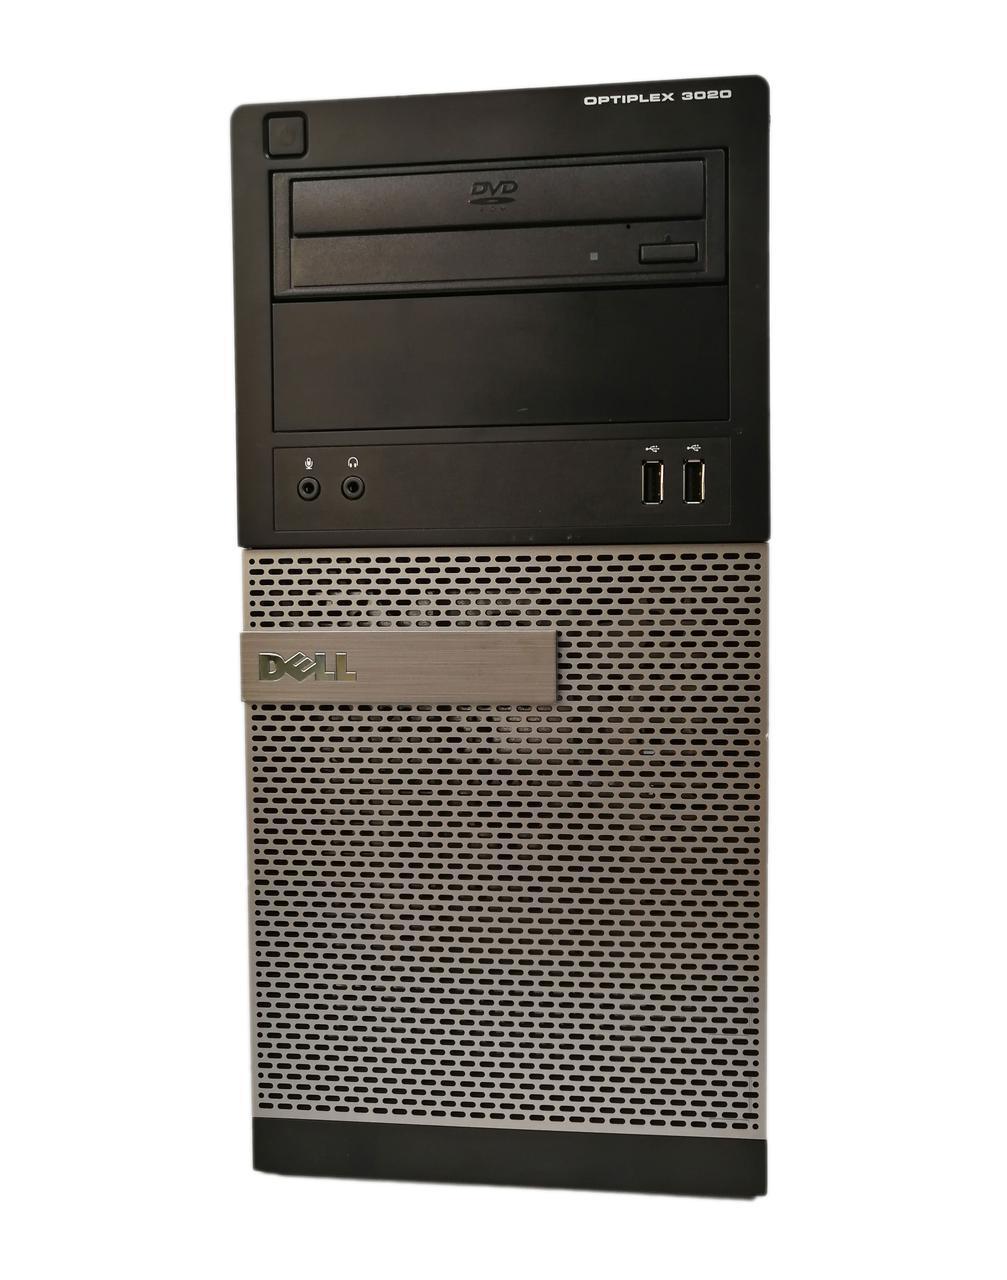 Компьютер Dell 3020 Tower, Intel Core i3-4150, 8ГБ DDR3, SSD 120ГБ